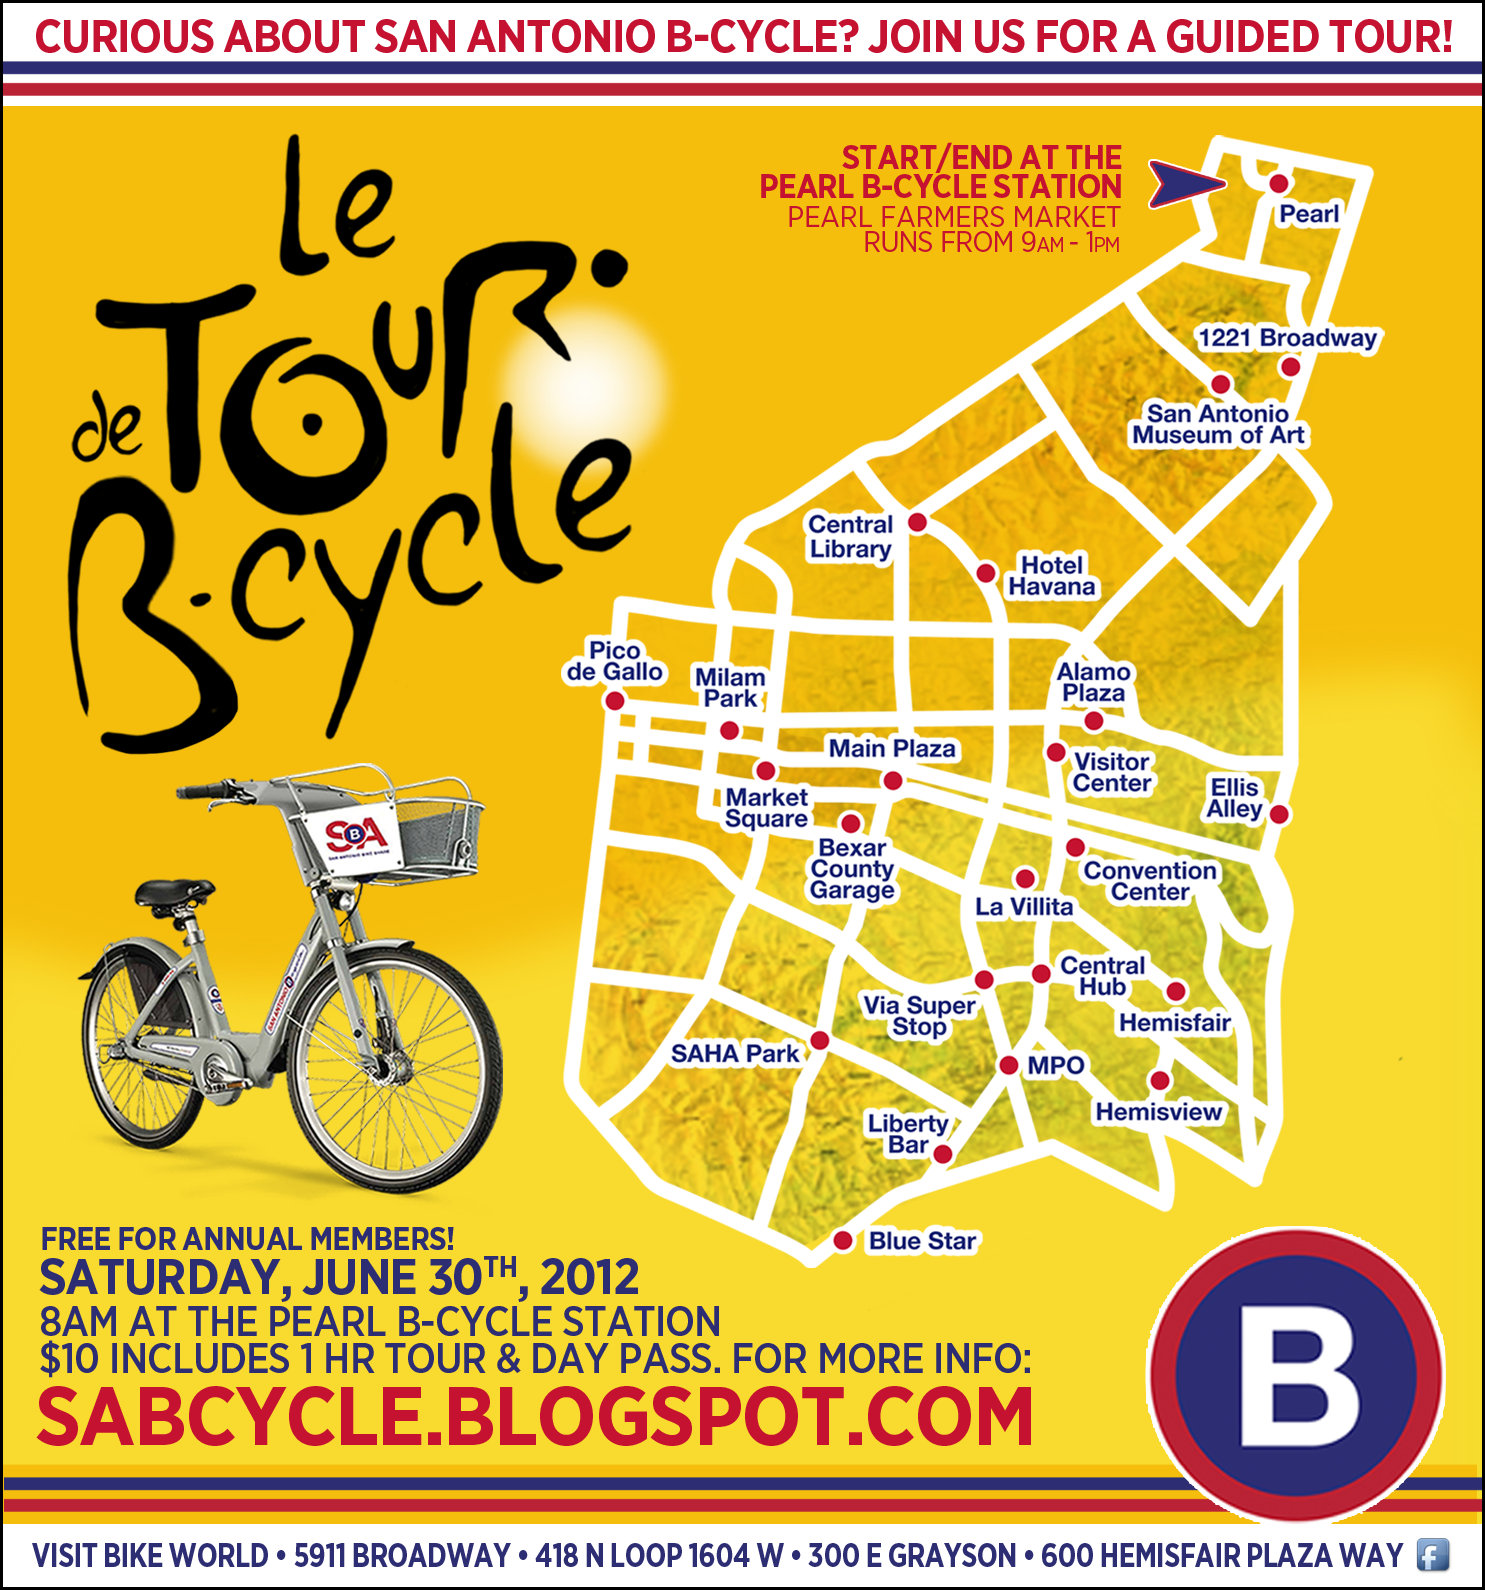 san antonio b cycle - photo #5